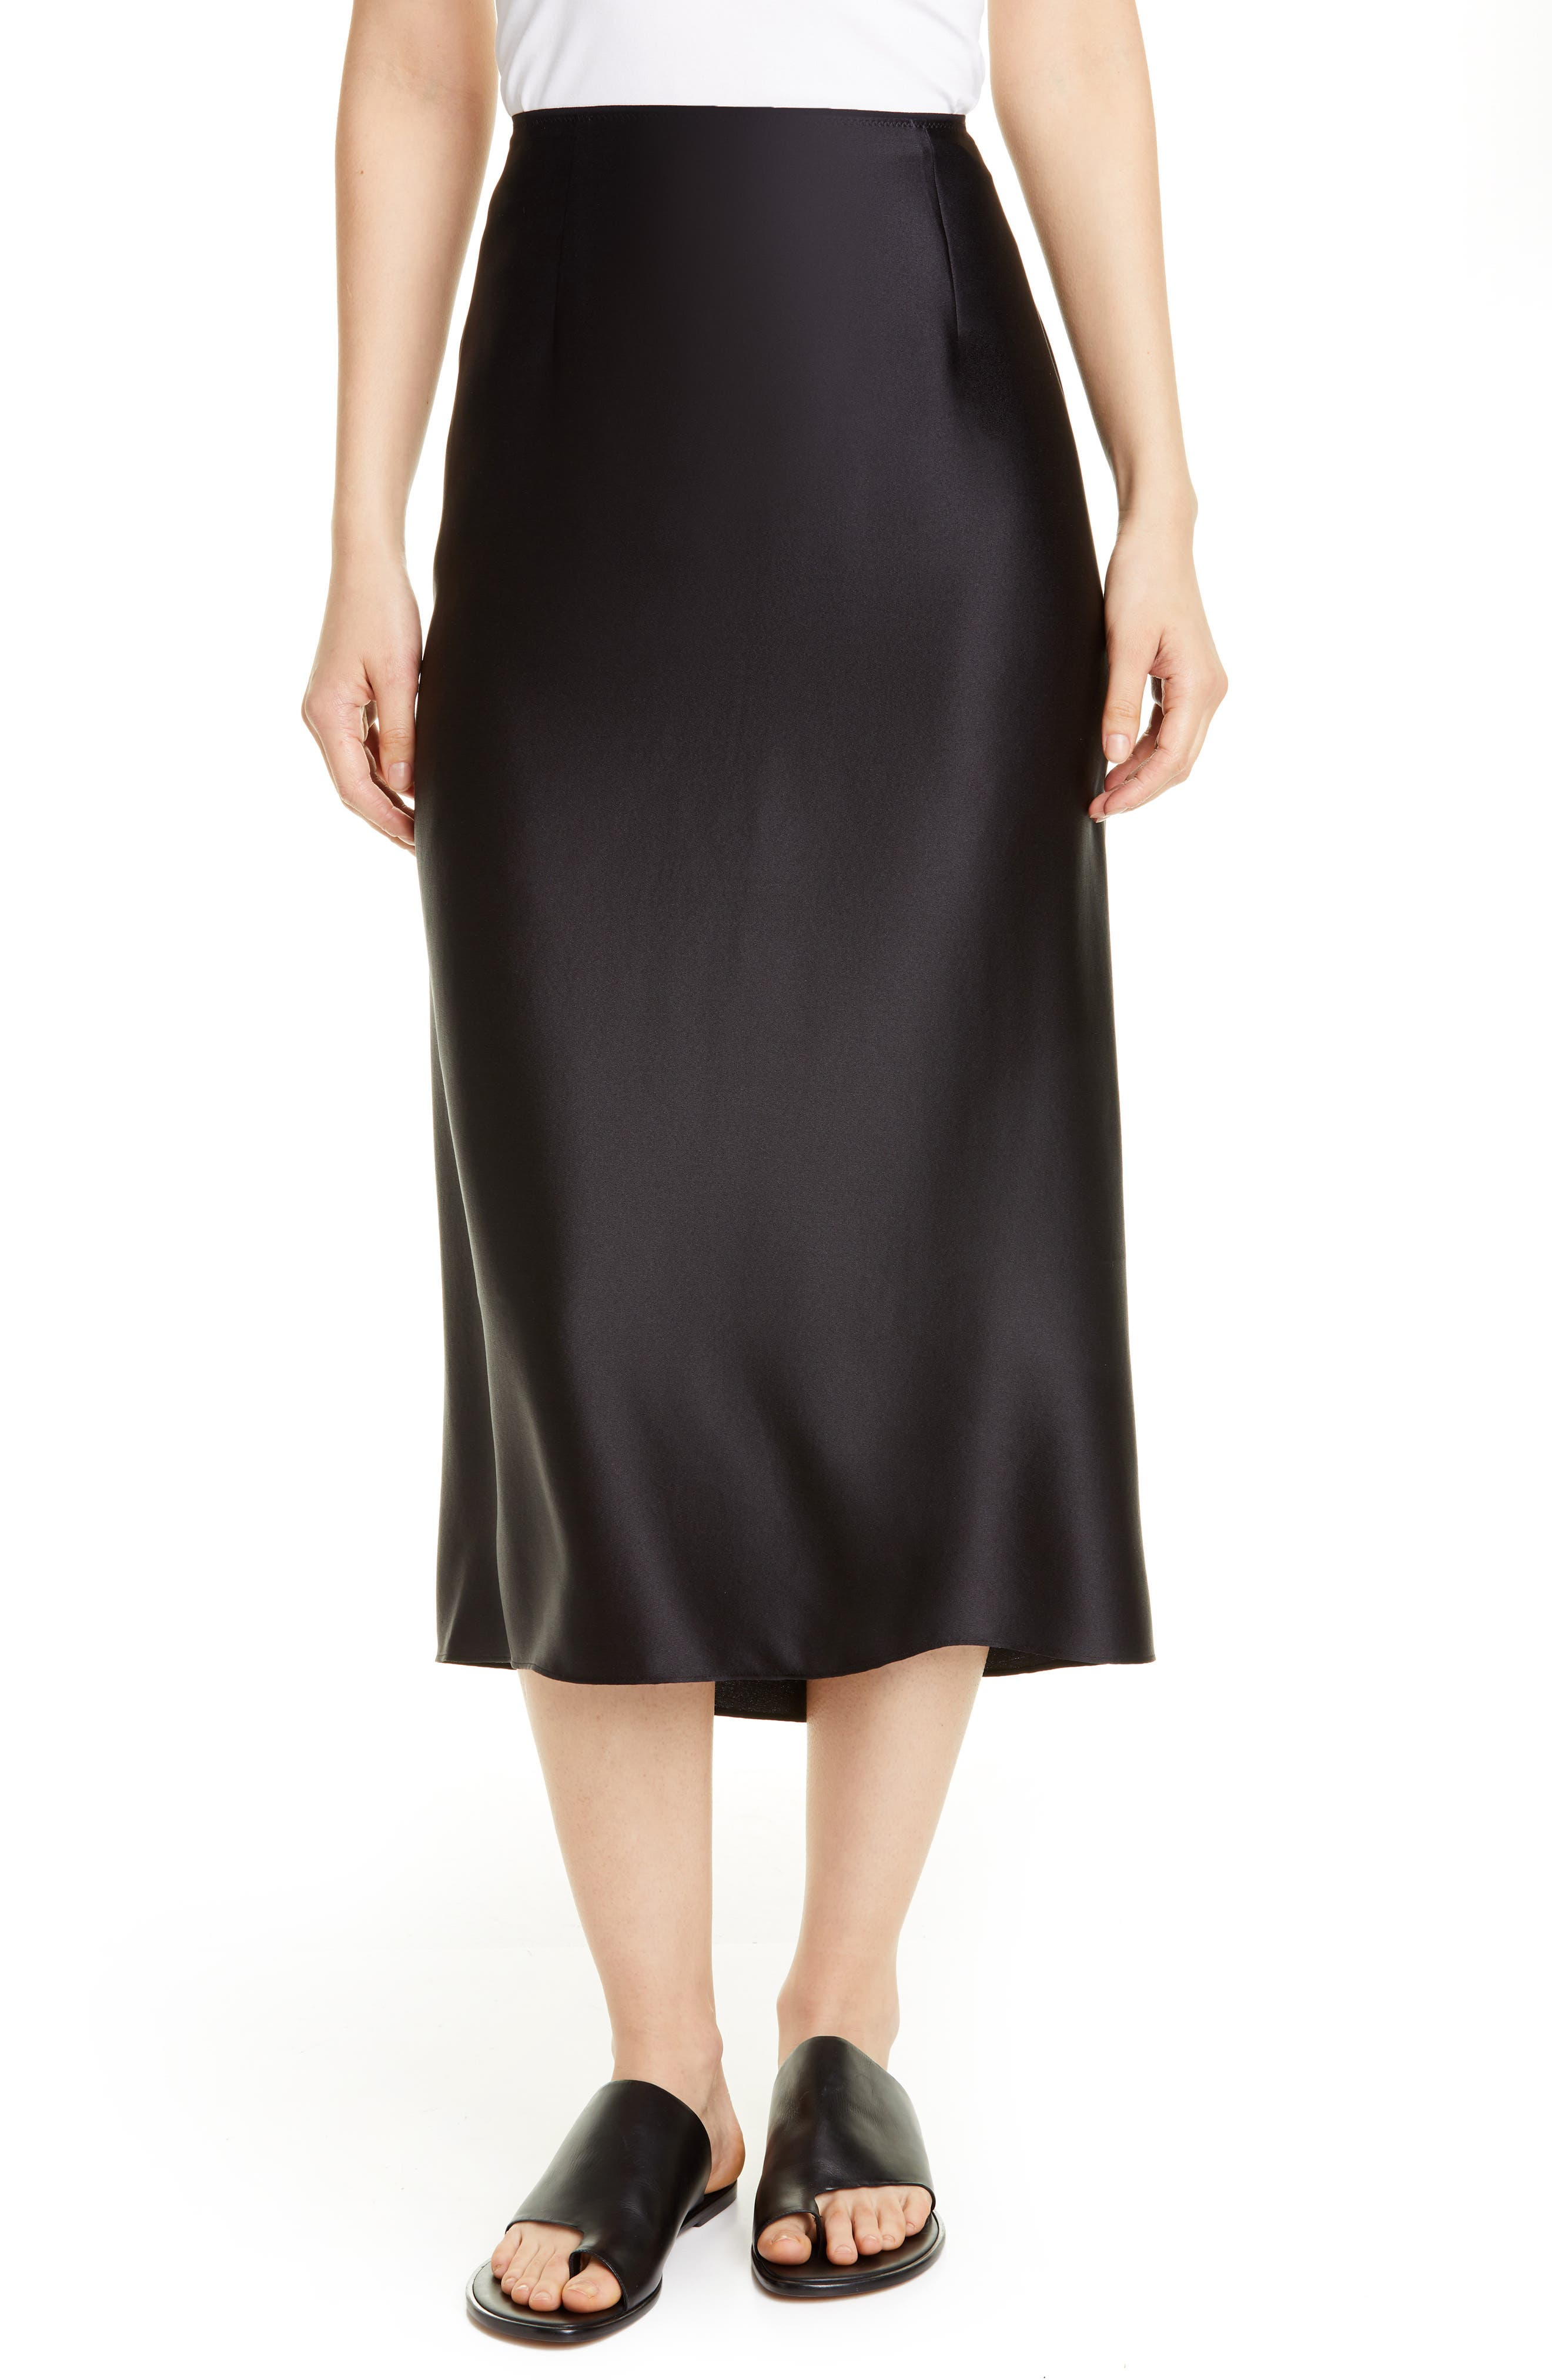 Vintage Inspired Slips Womens Vince Silk Slip Skirt Size 10 - Black $275.00 AT vintagedancer.com